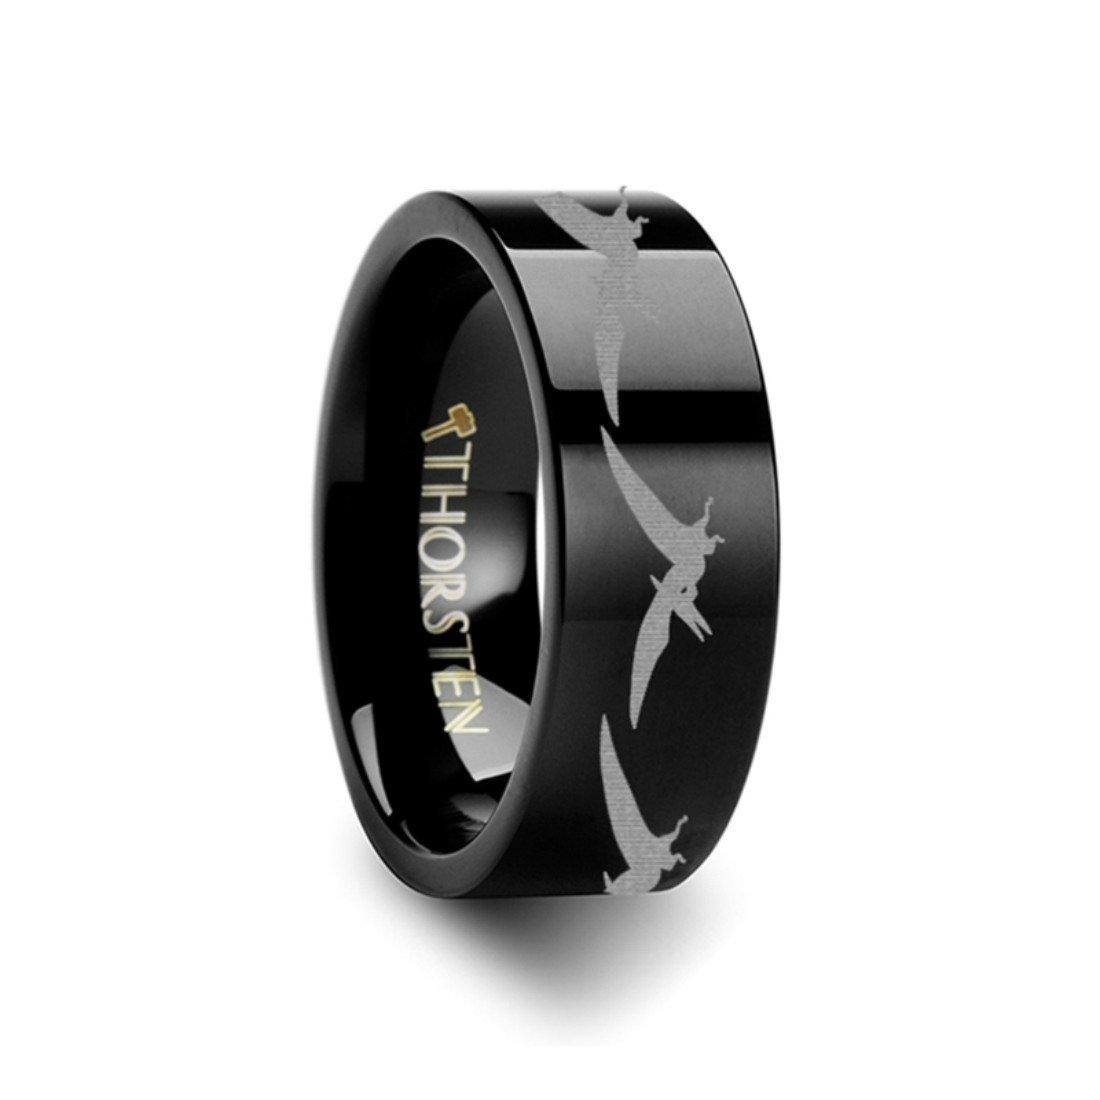 Thorsten Dinosaur Ring Teradactyl Prehistoric Paleo Flat Black Tungsten Ring 8mm Wide Wedding Band from Roy Rose Jewelry